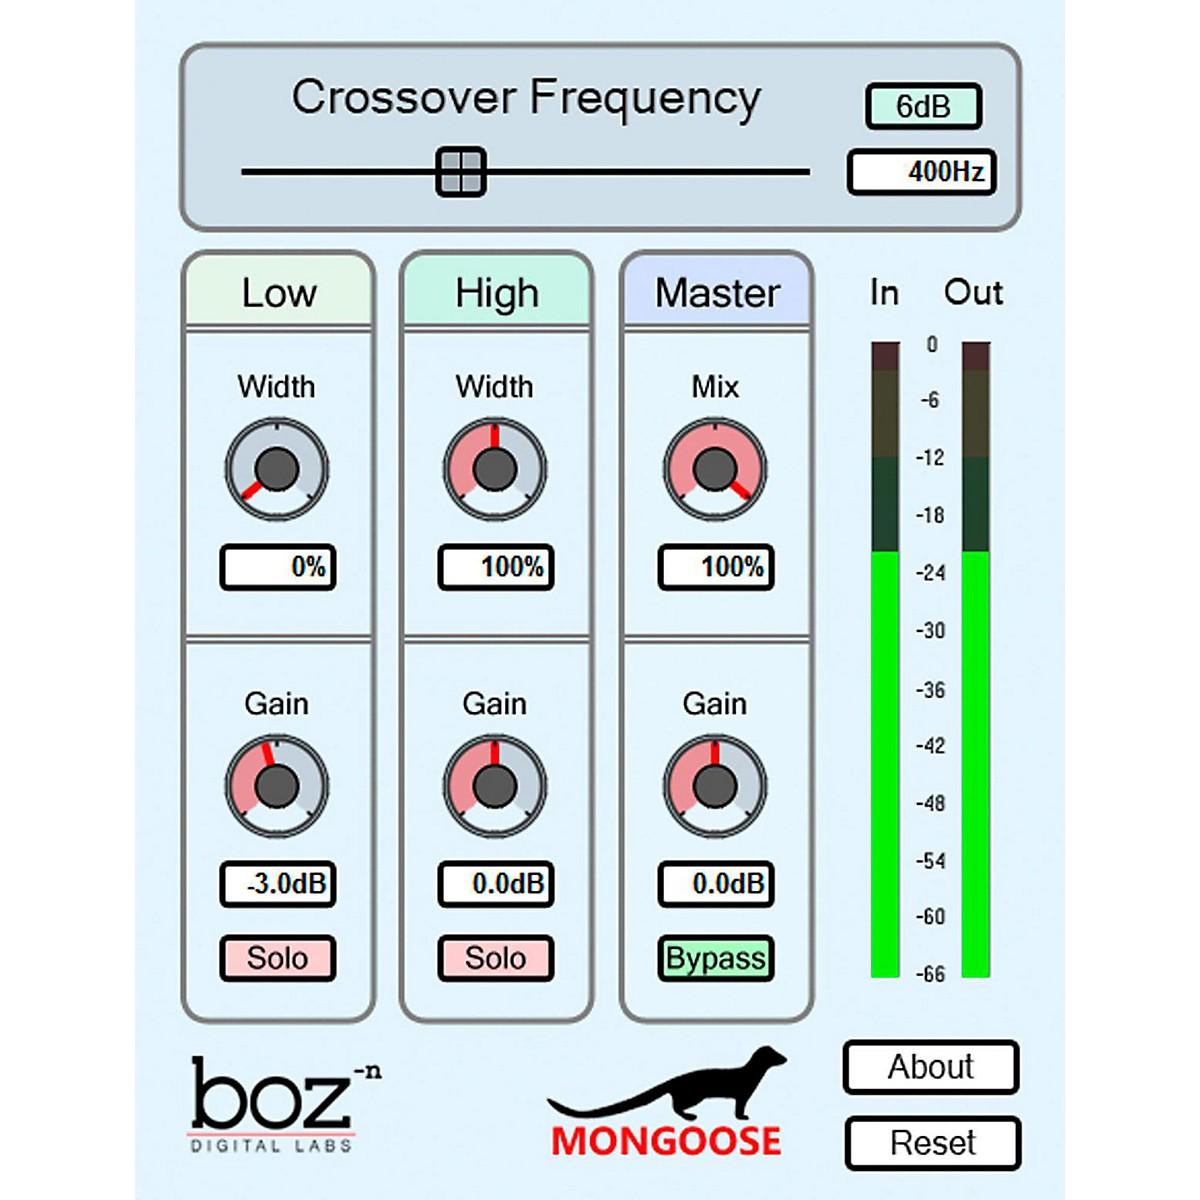 BOZ DIGITAL LABS Mongoose